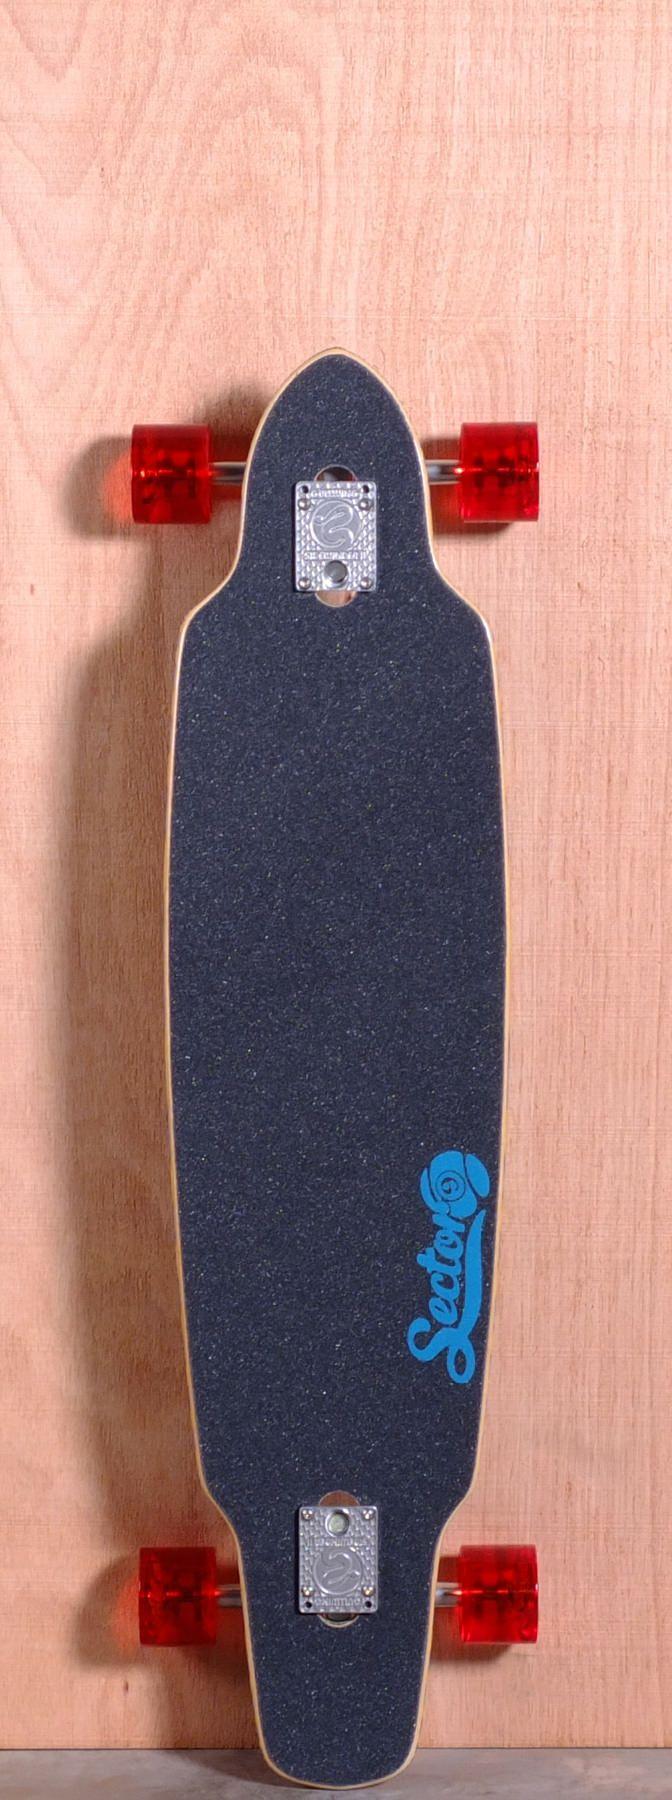 "Sector 9 39"" Horizon Longboard Complete - Blue"